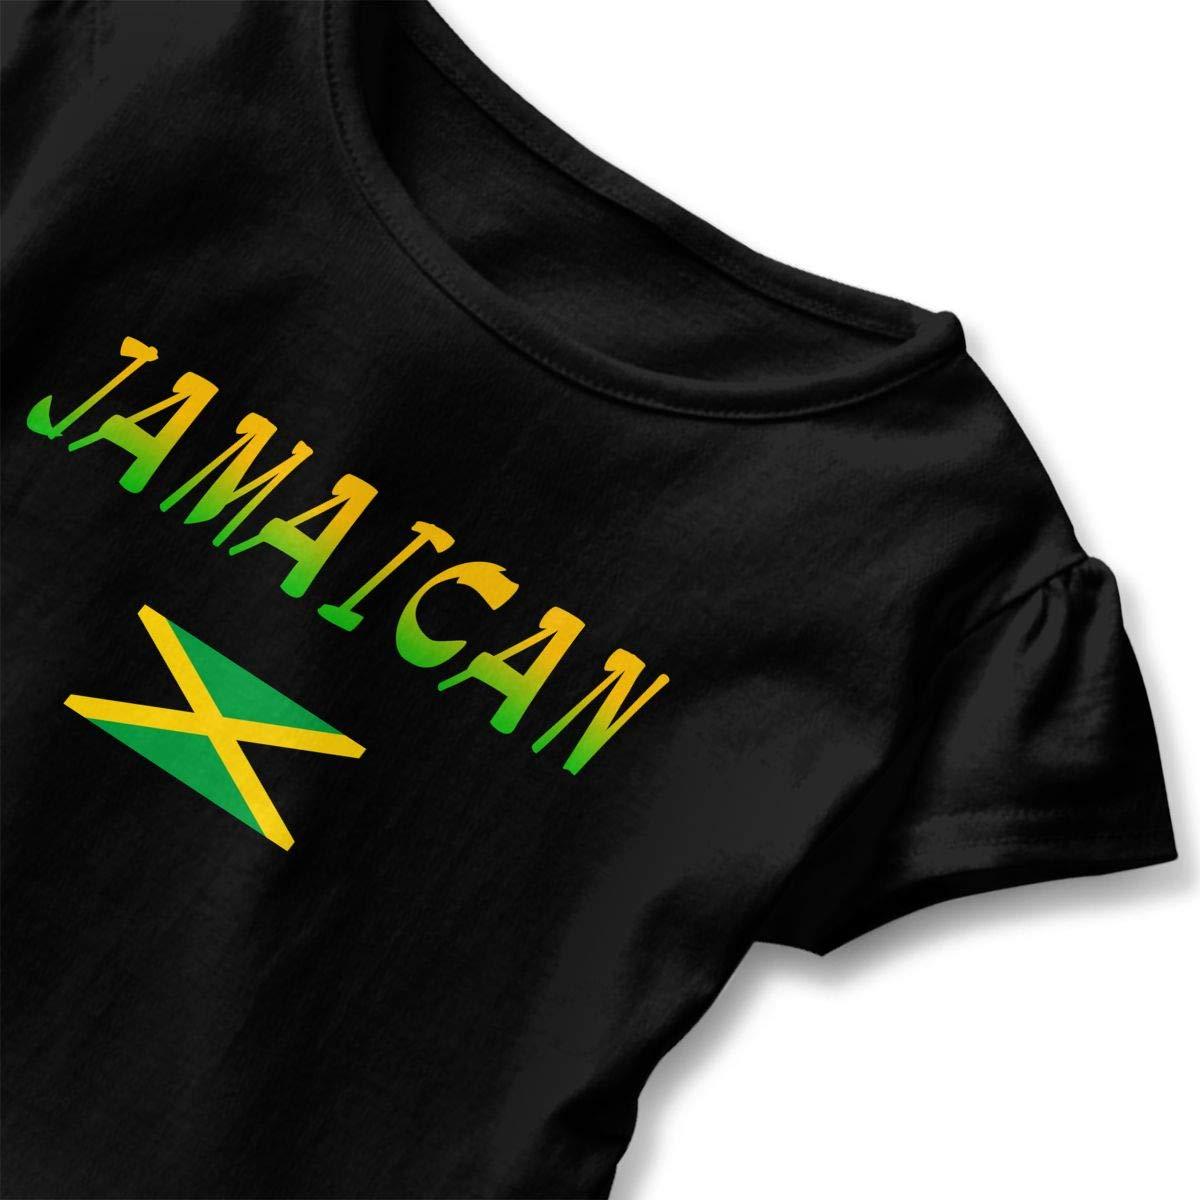 Jamaican Flag Toddler Baby Girls Cotton Ruffle Short Sleeve Top Cute T-Shirt 2-6T